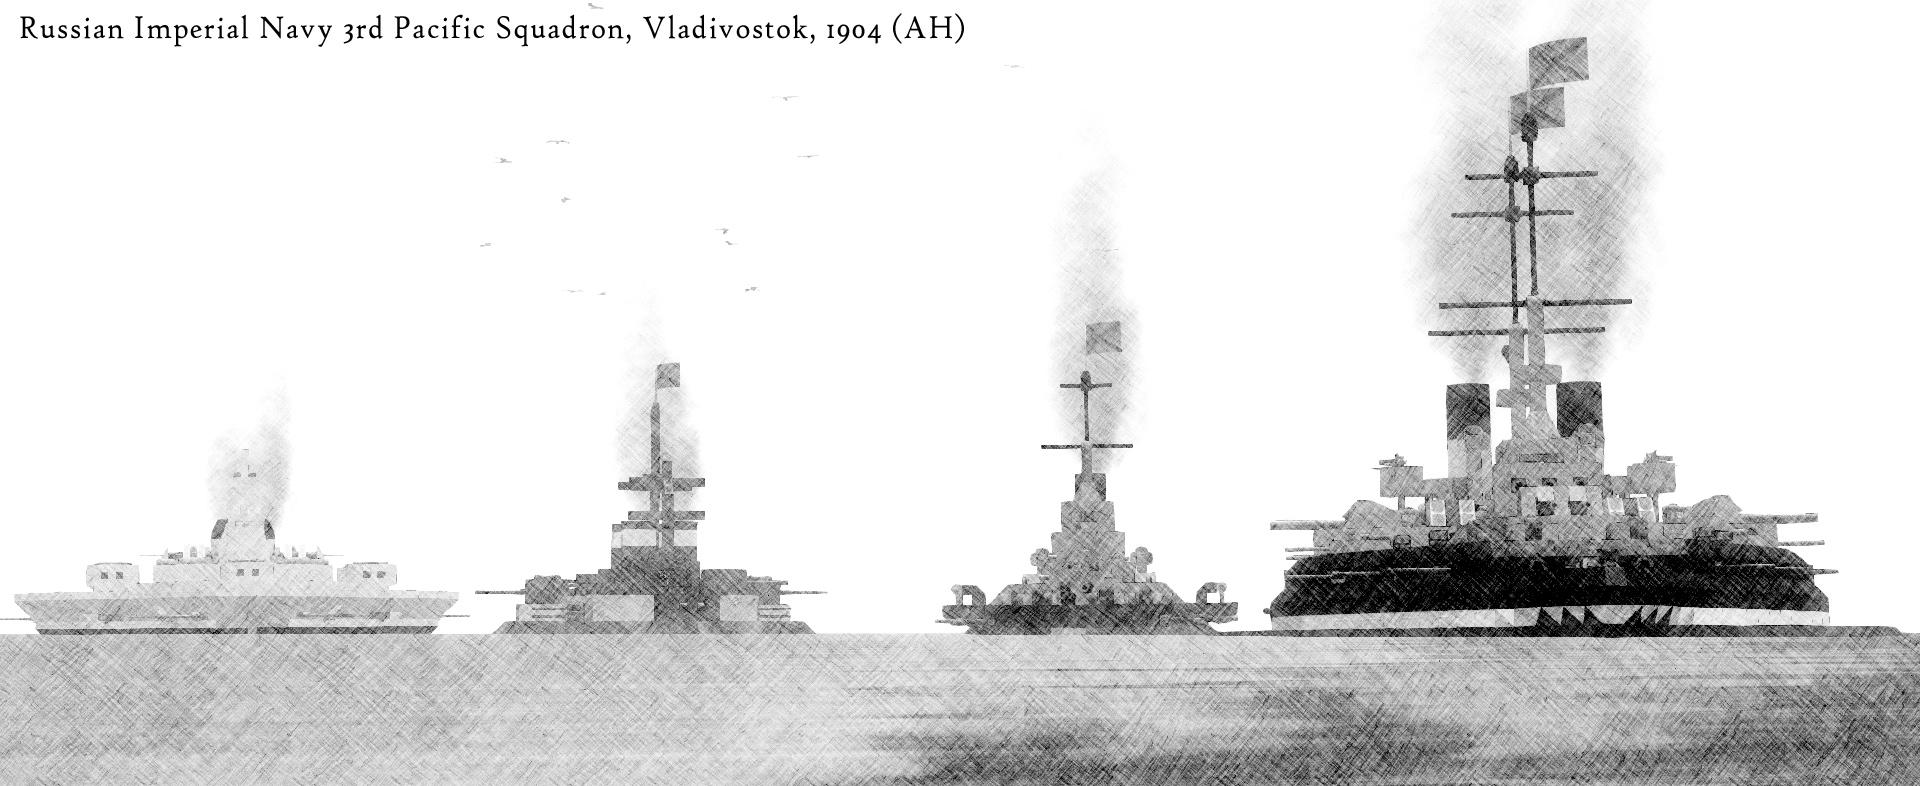 [Image: 1905_3rd_Pacific_Sqn_e.jpg]